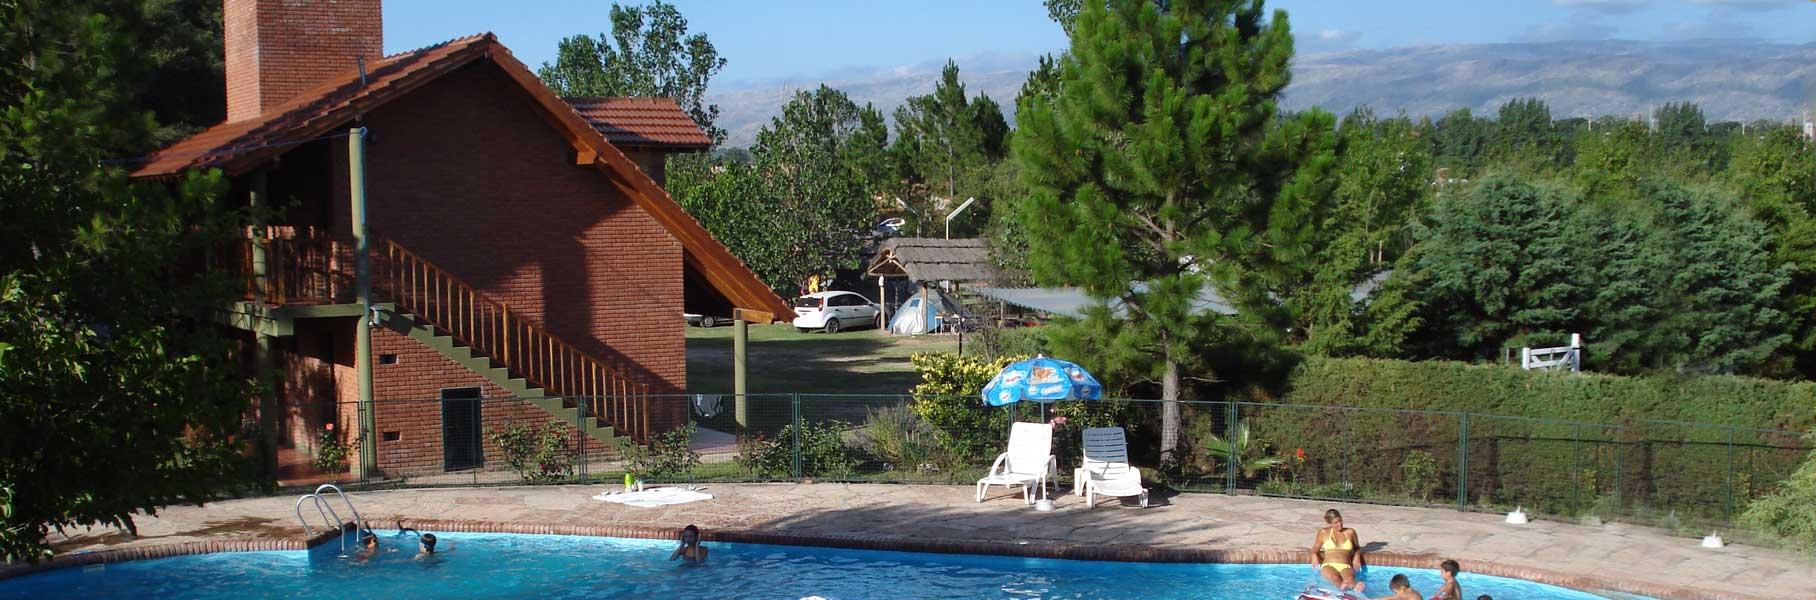 Complejo san sebastian camping y hotel en mina clavero - Hotel iturregi san sebastian ...